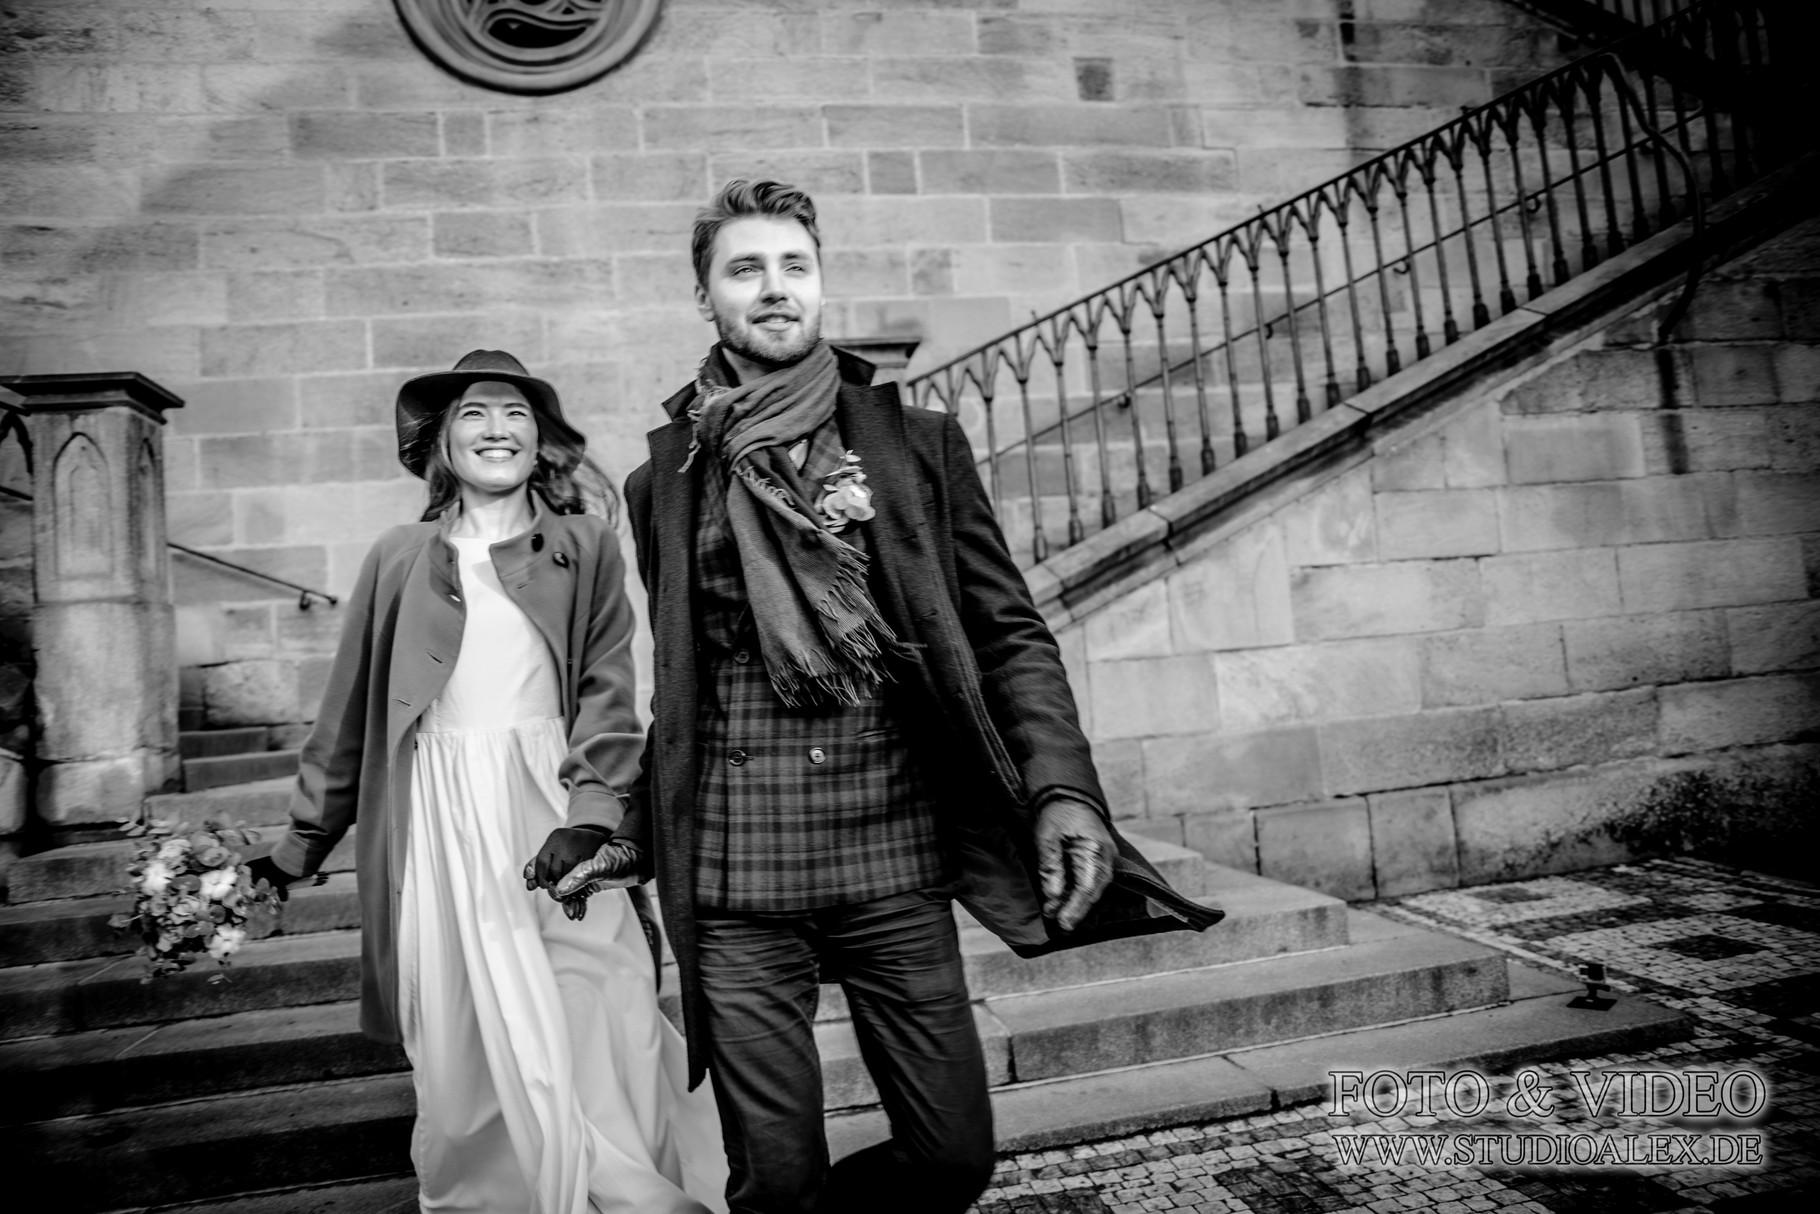 Fotograf Alexander Dechant in Prag